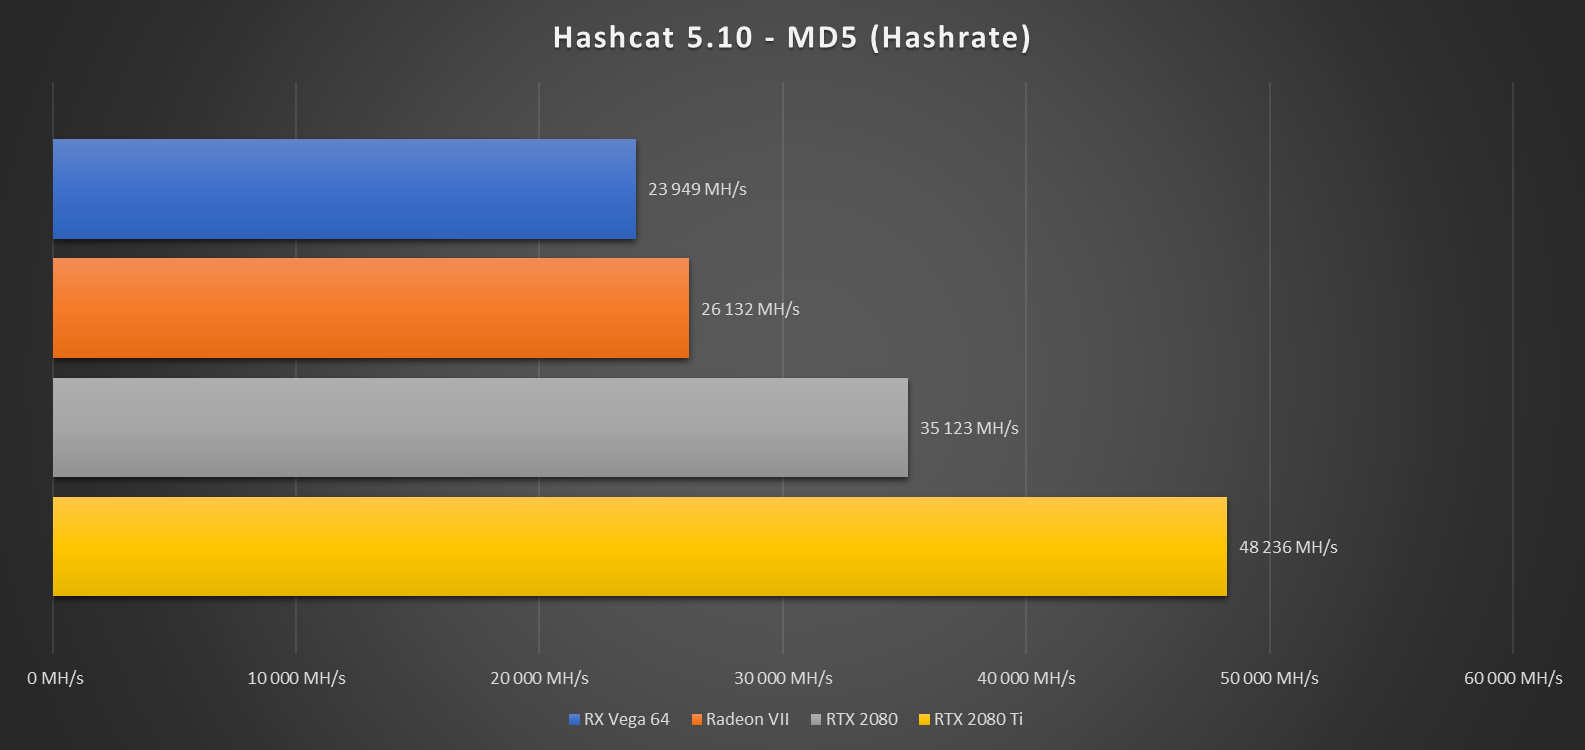 Test | Radeon VII, RX Vega 64, GeForce RTX 2080 (Ti